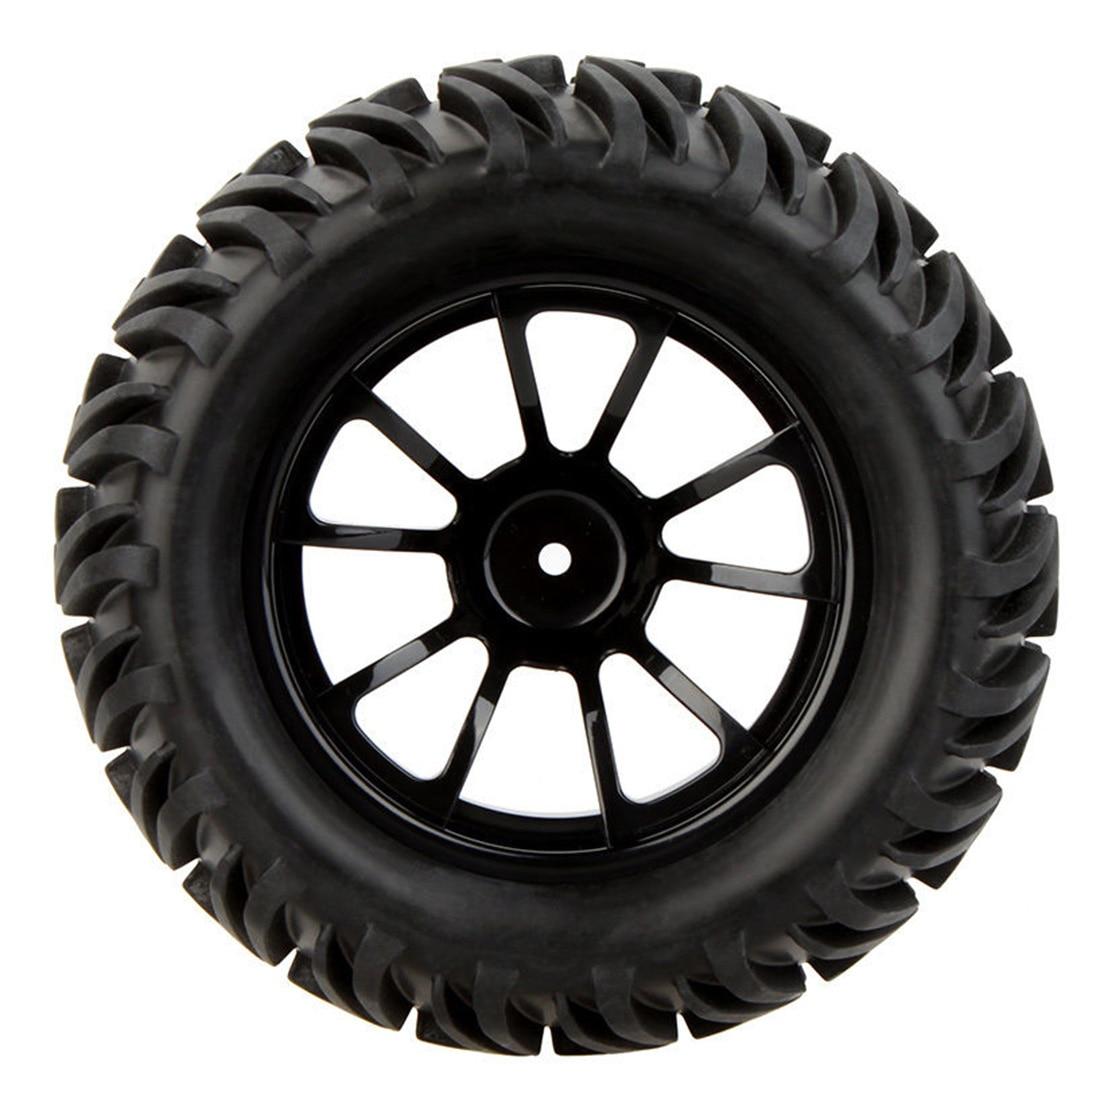 4Pcs 1/10 Monster Truck Wheel Rim and Tire 8010 fr Traxxas HSP Tamiya HPI RC Car